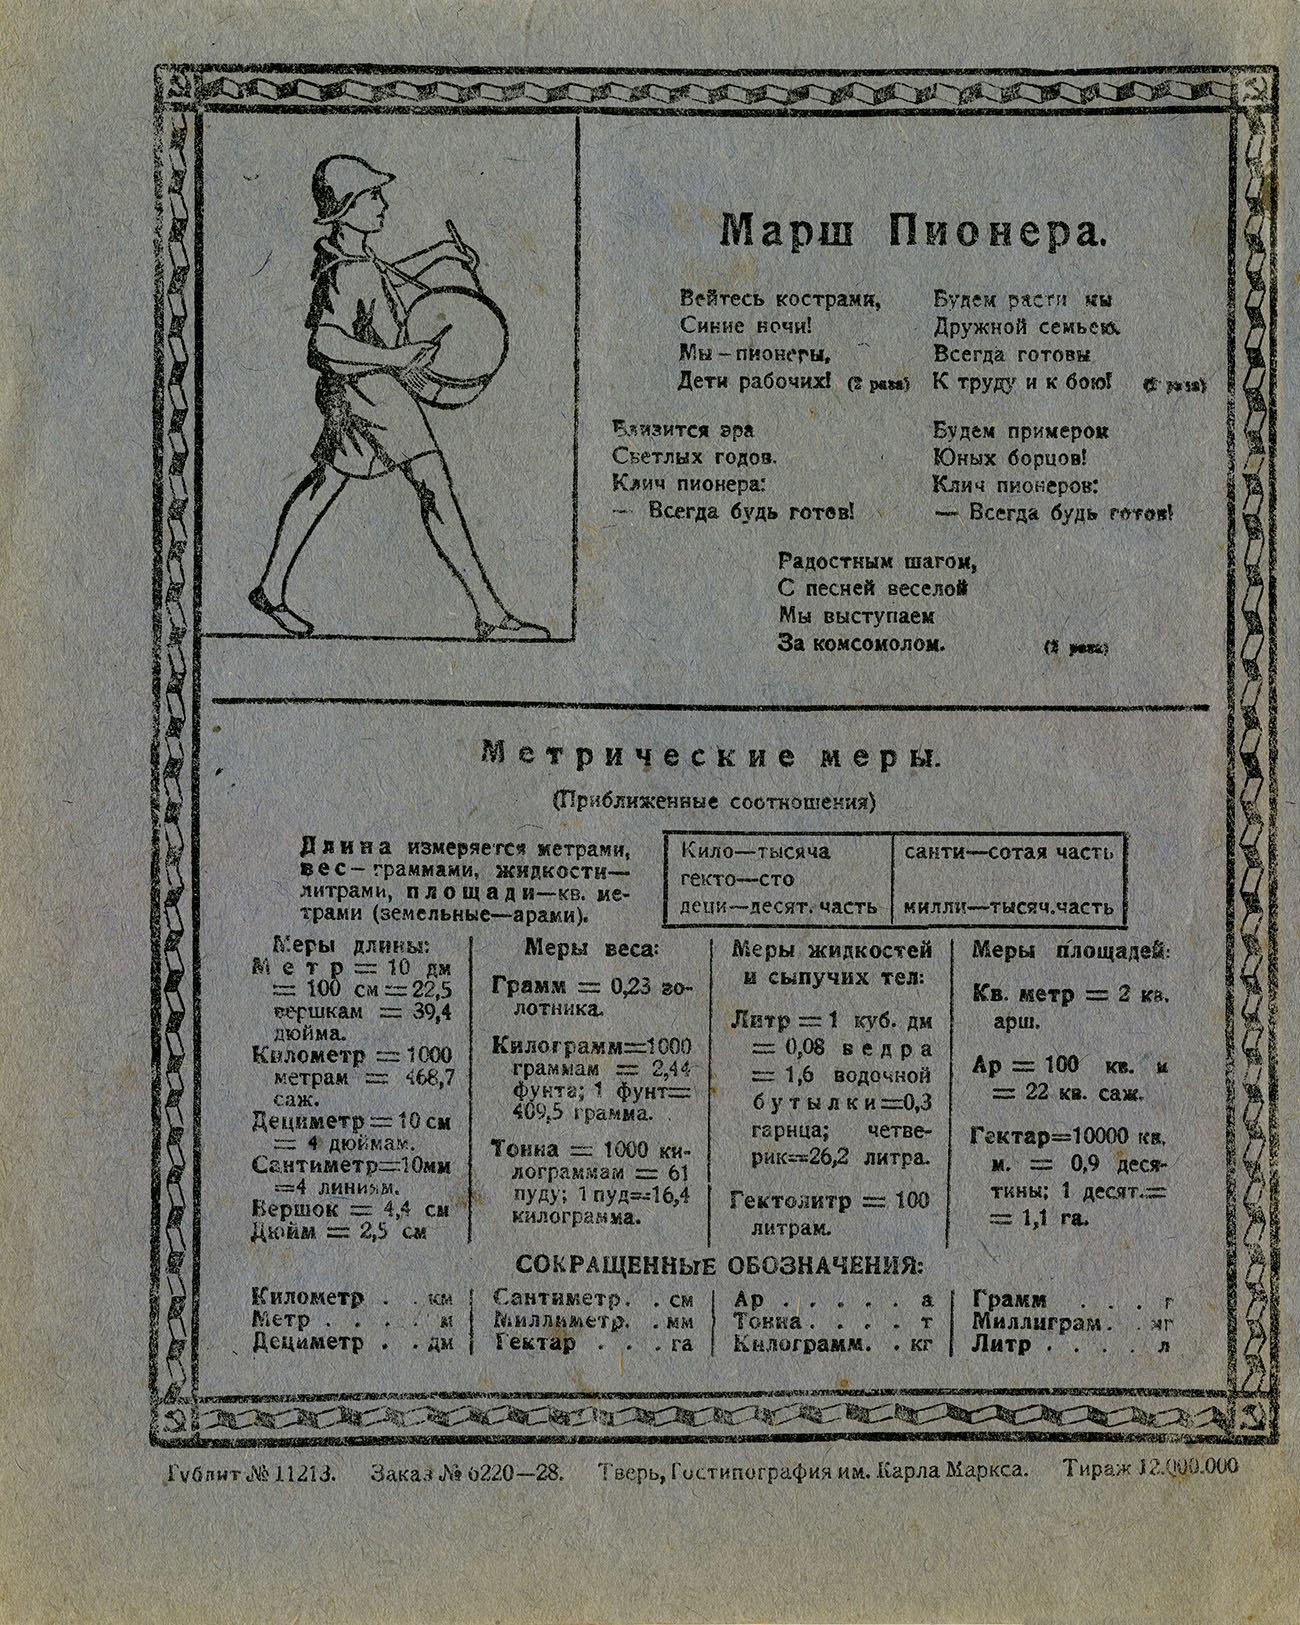 Тетрадь Луначарский, 1928. оборот